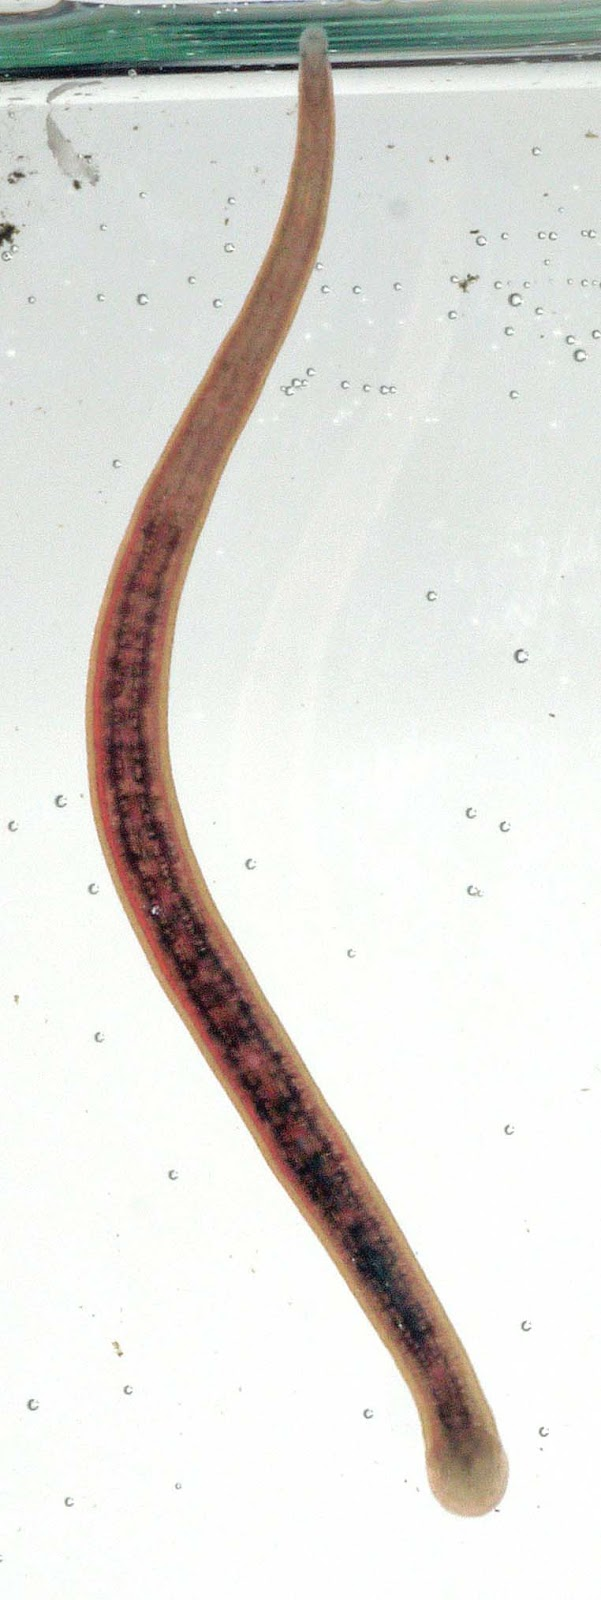 Leeches In Water